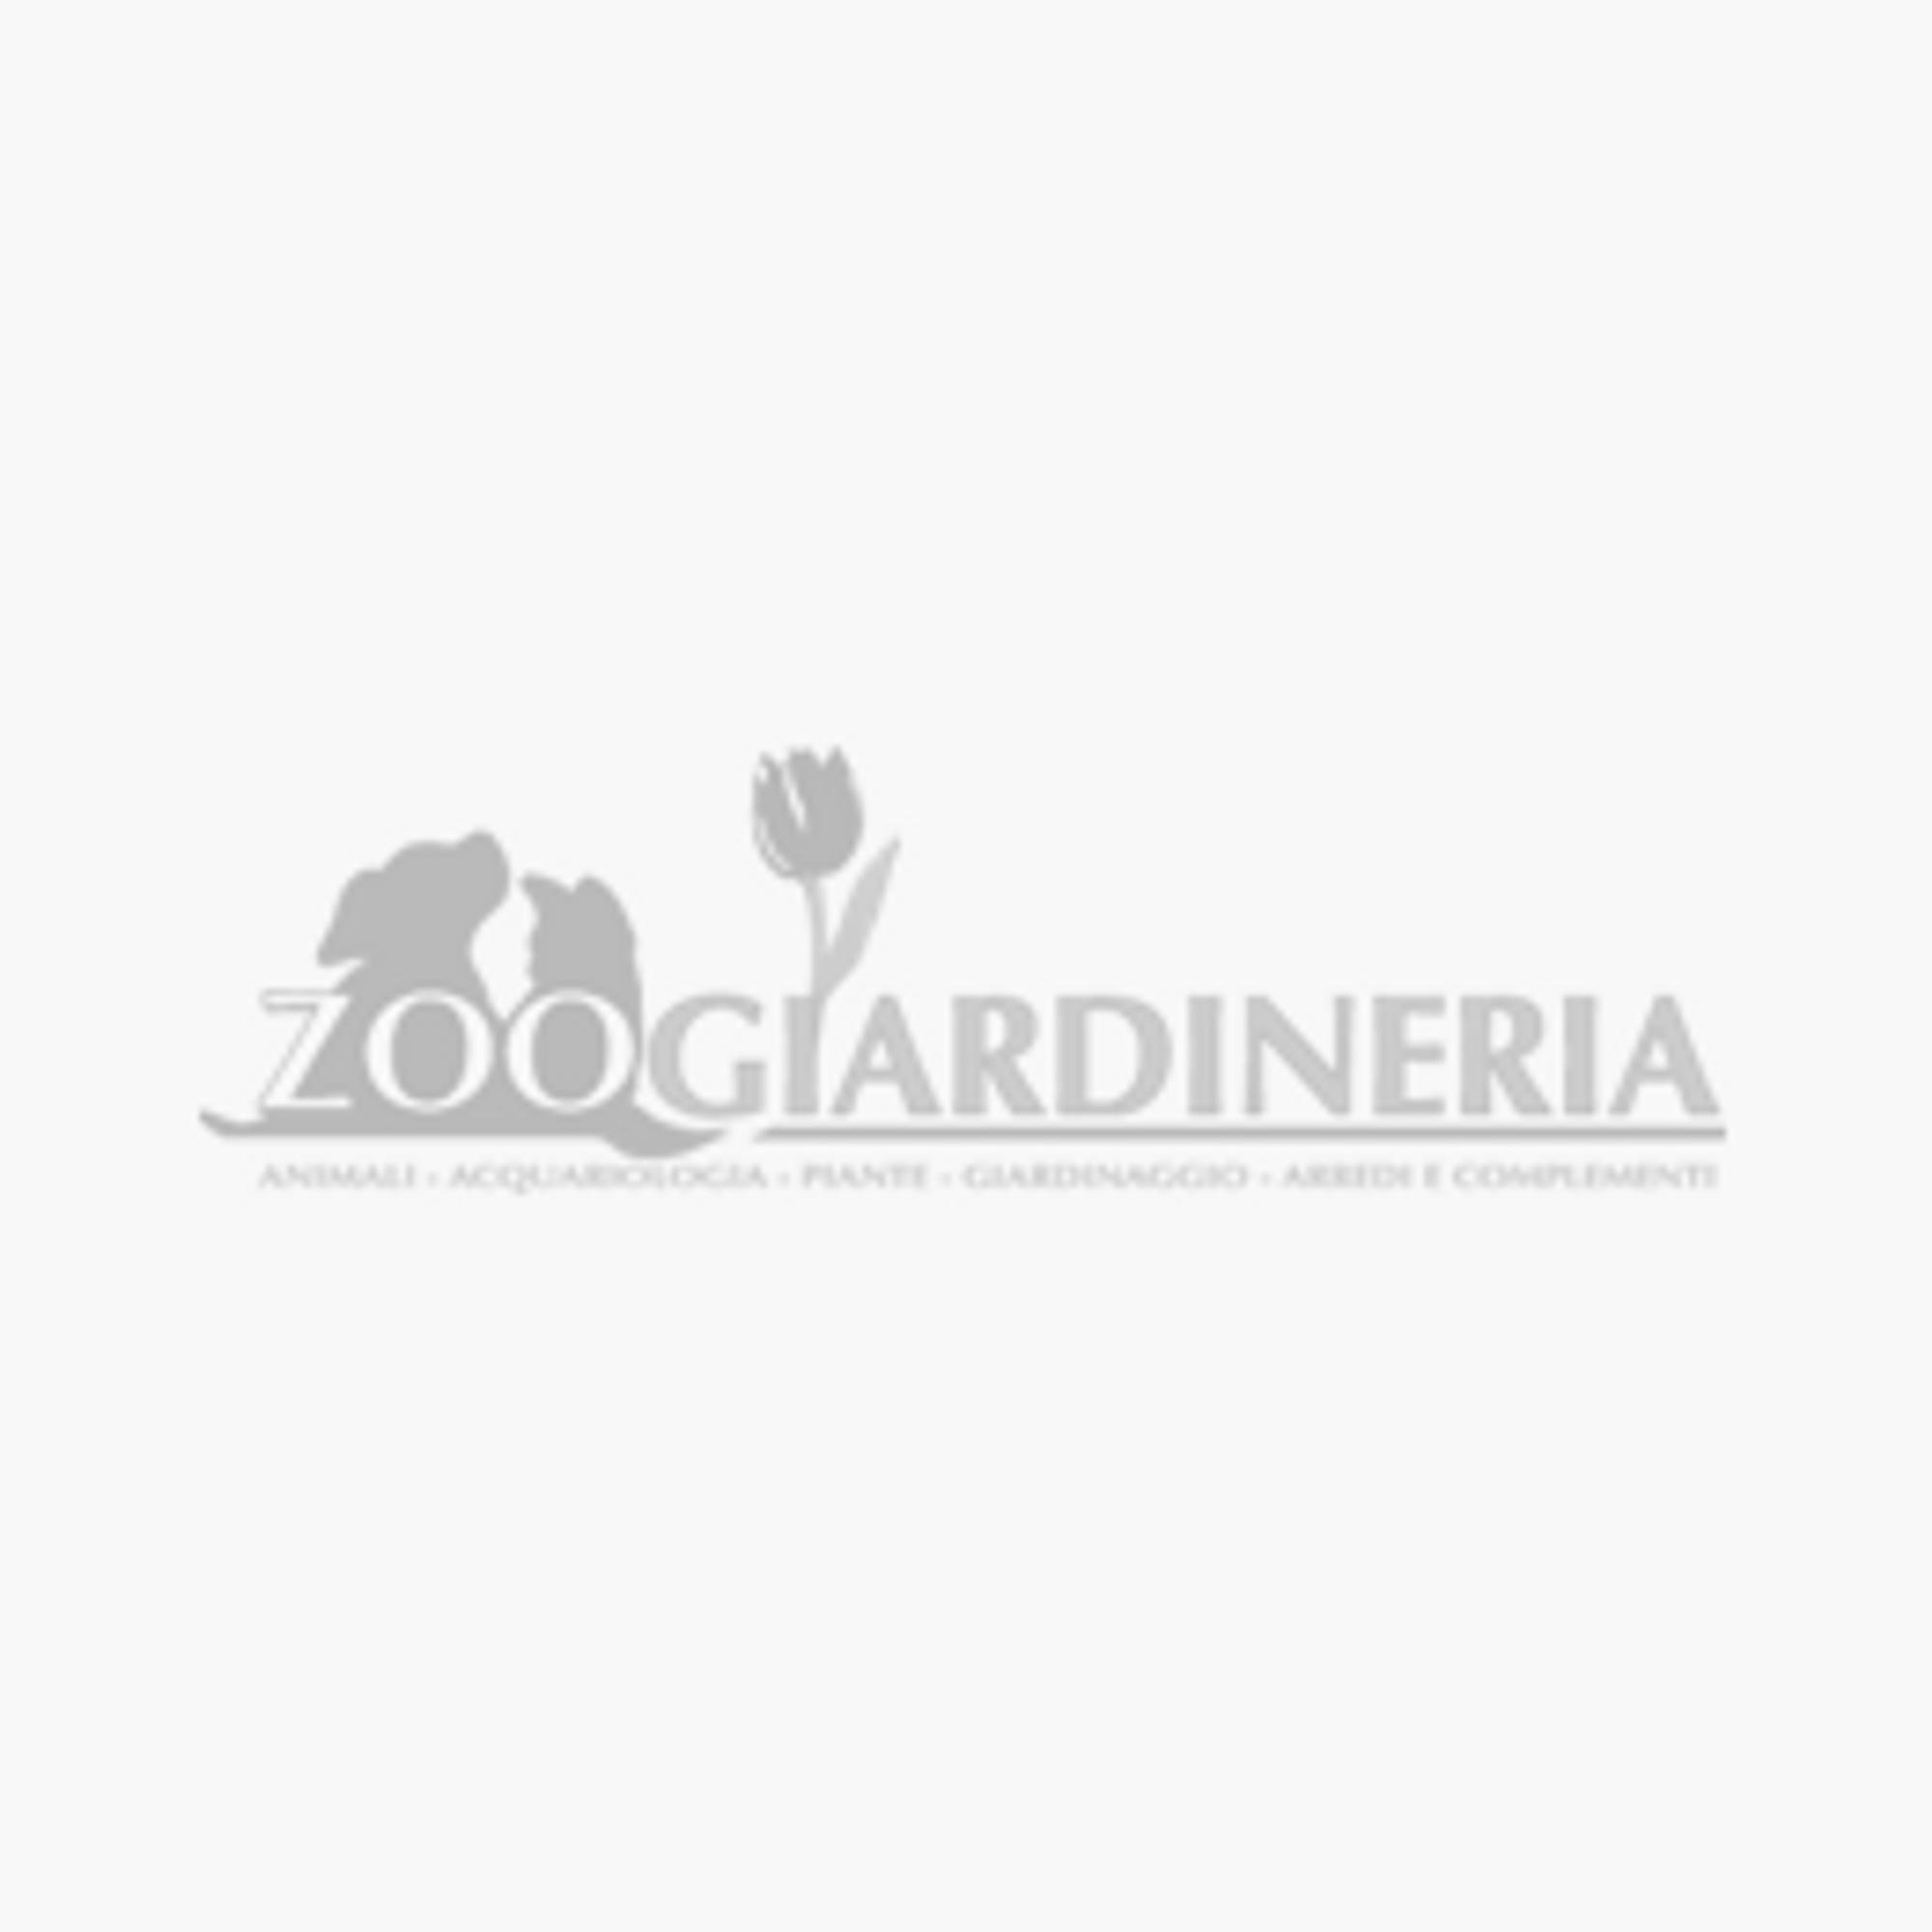 Catena 20 MicroLED BIANCO CALDO 1,5mm Luce Fissa a Batteria 2xCR2032 3V Portatile IP20 Cavo Metal